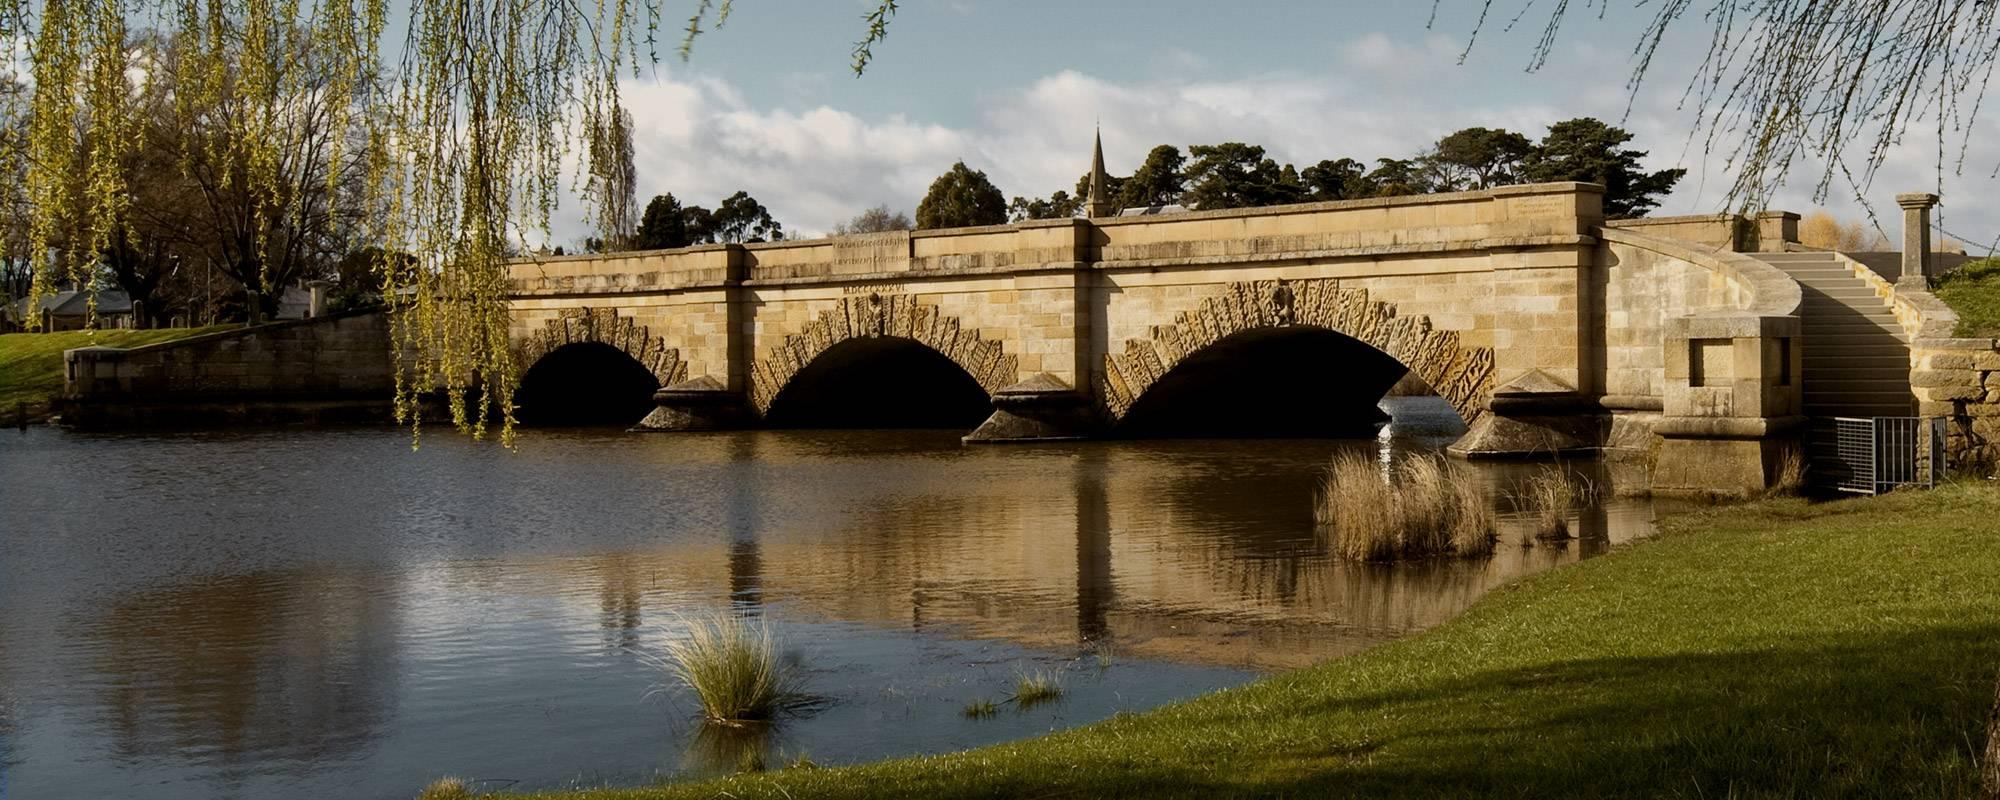 Tasmania S Finest Heritage Village Northern Midlands Council